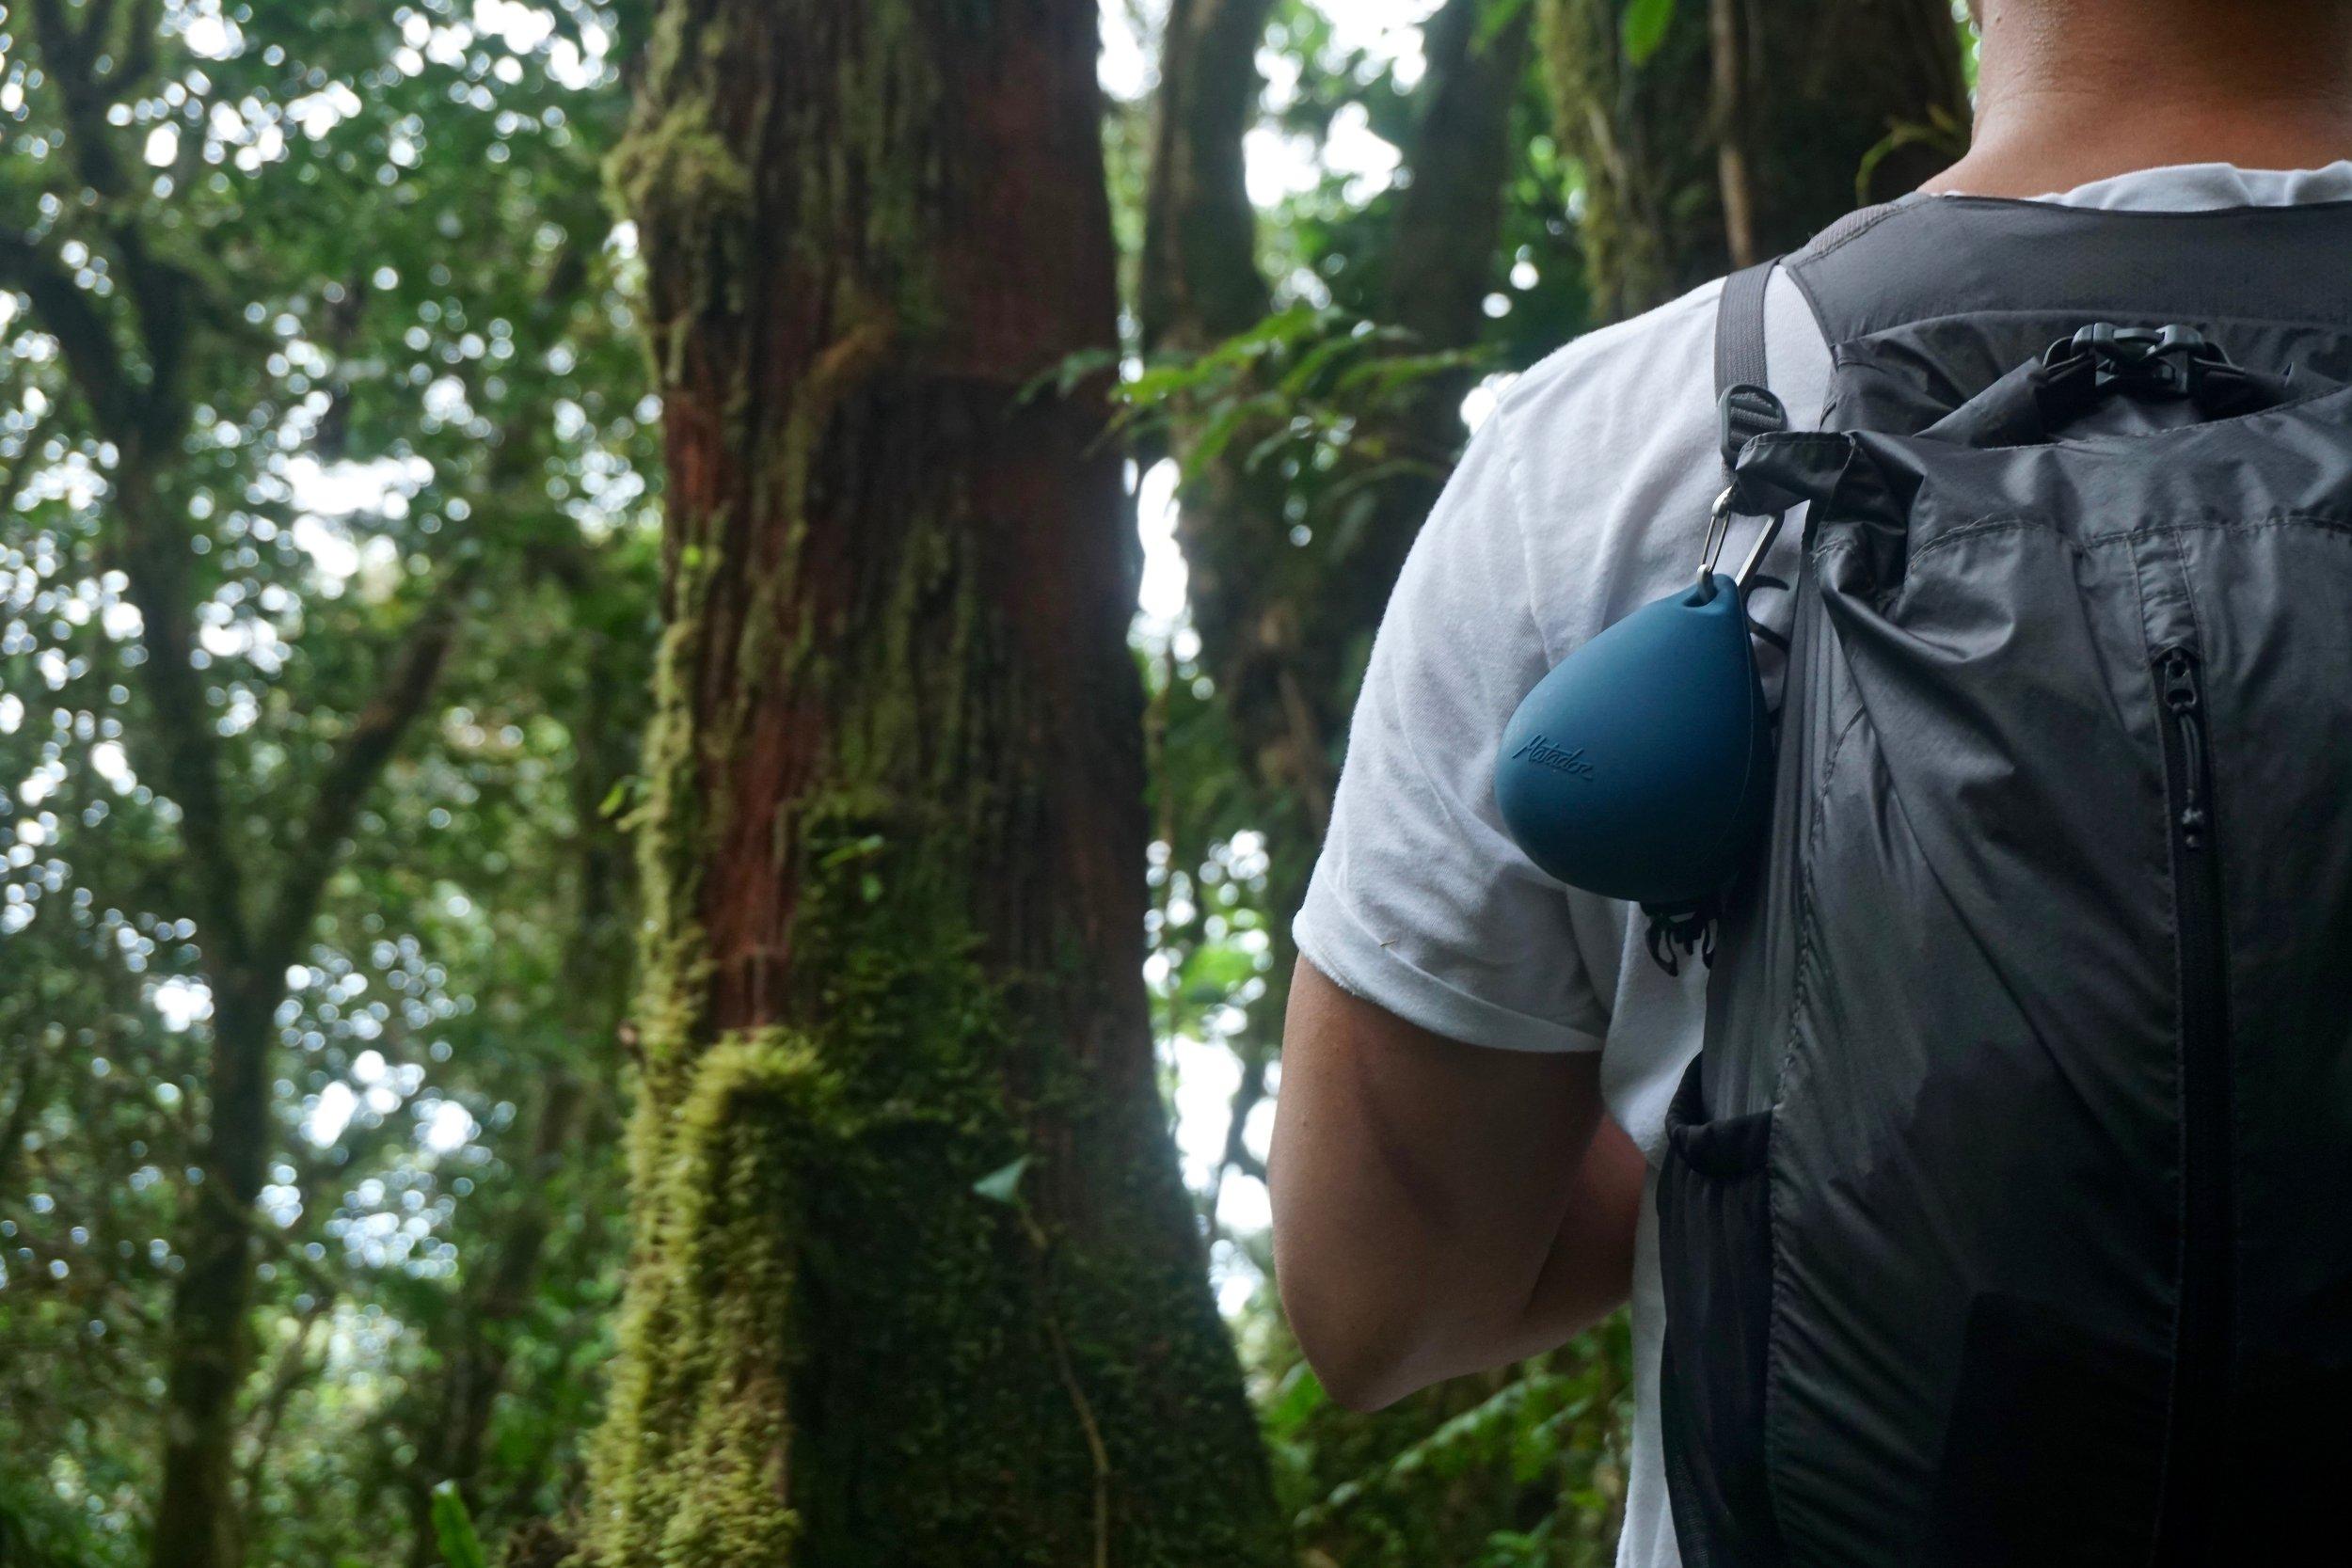 Matador Freerain24 Backpack - $59.99